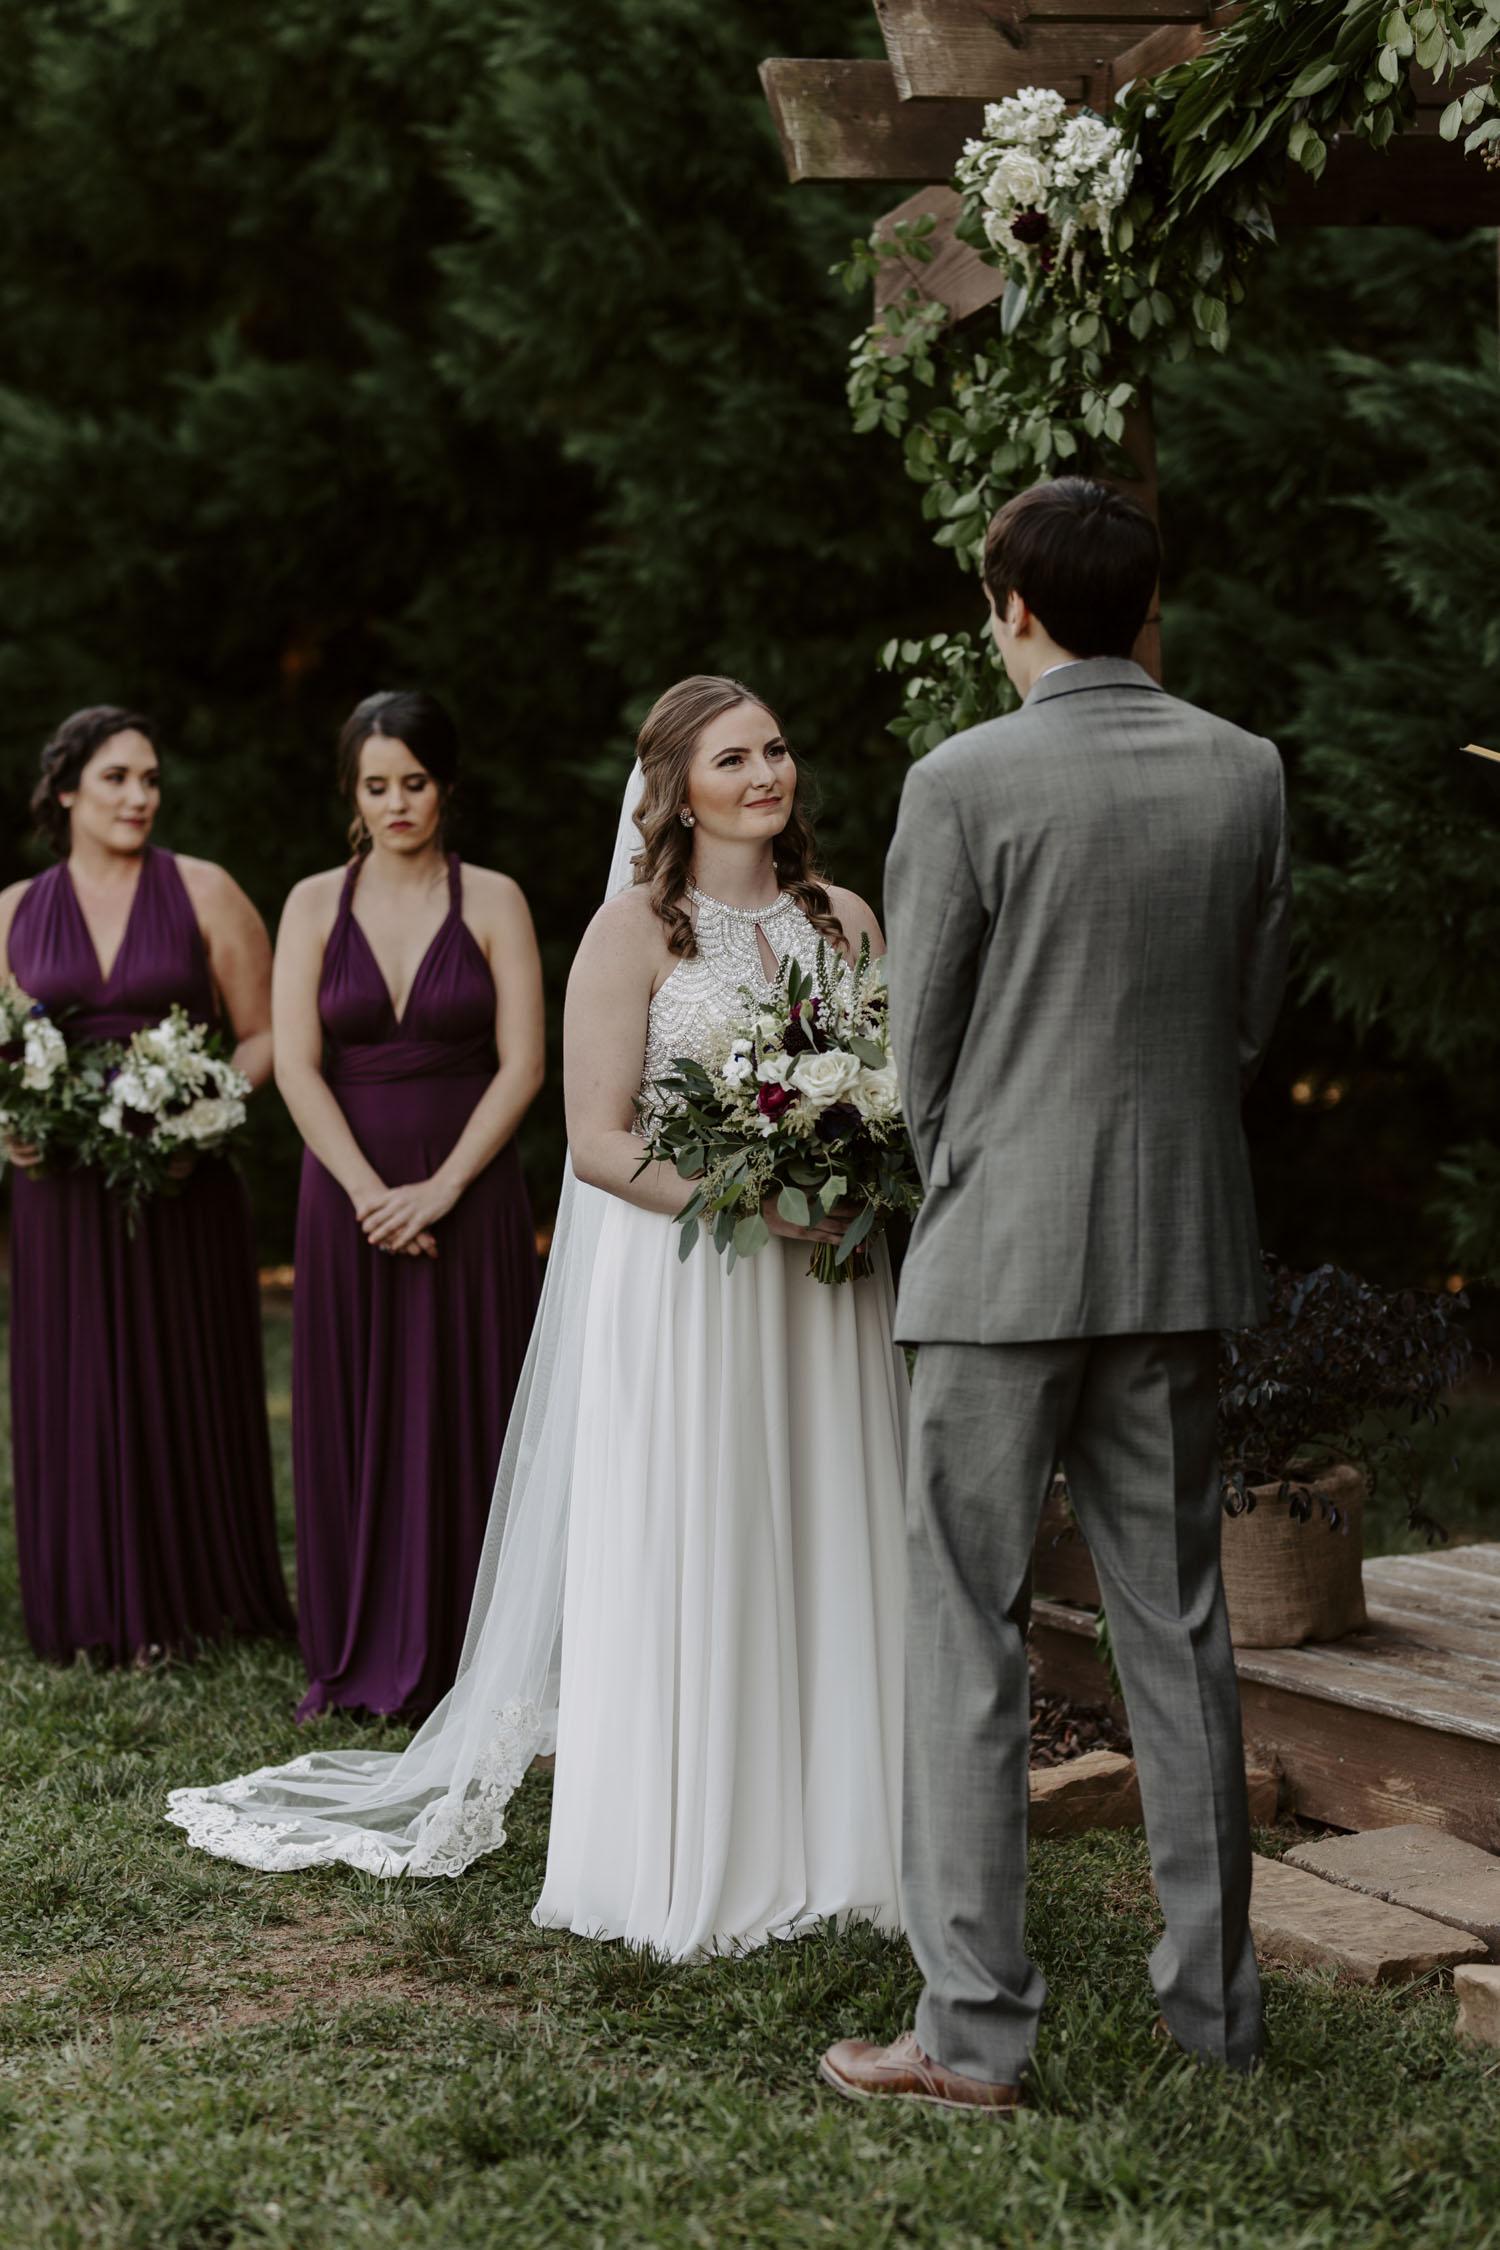 Chapel Hill Wedding Ceremony | Kayli LaFon Photography, North Carolina Intimate Wedding Photographer